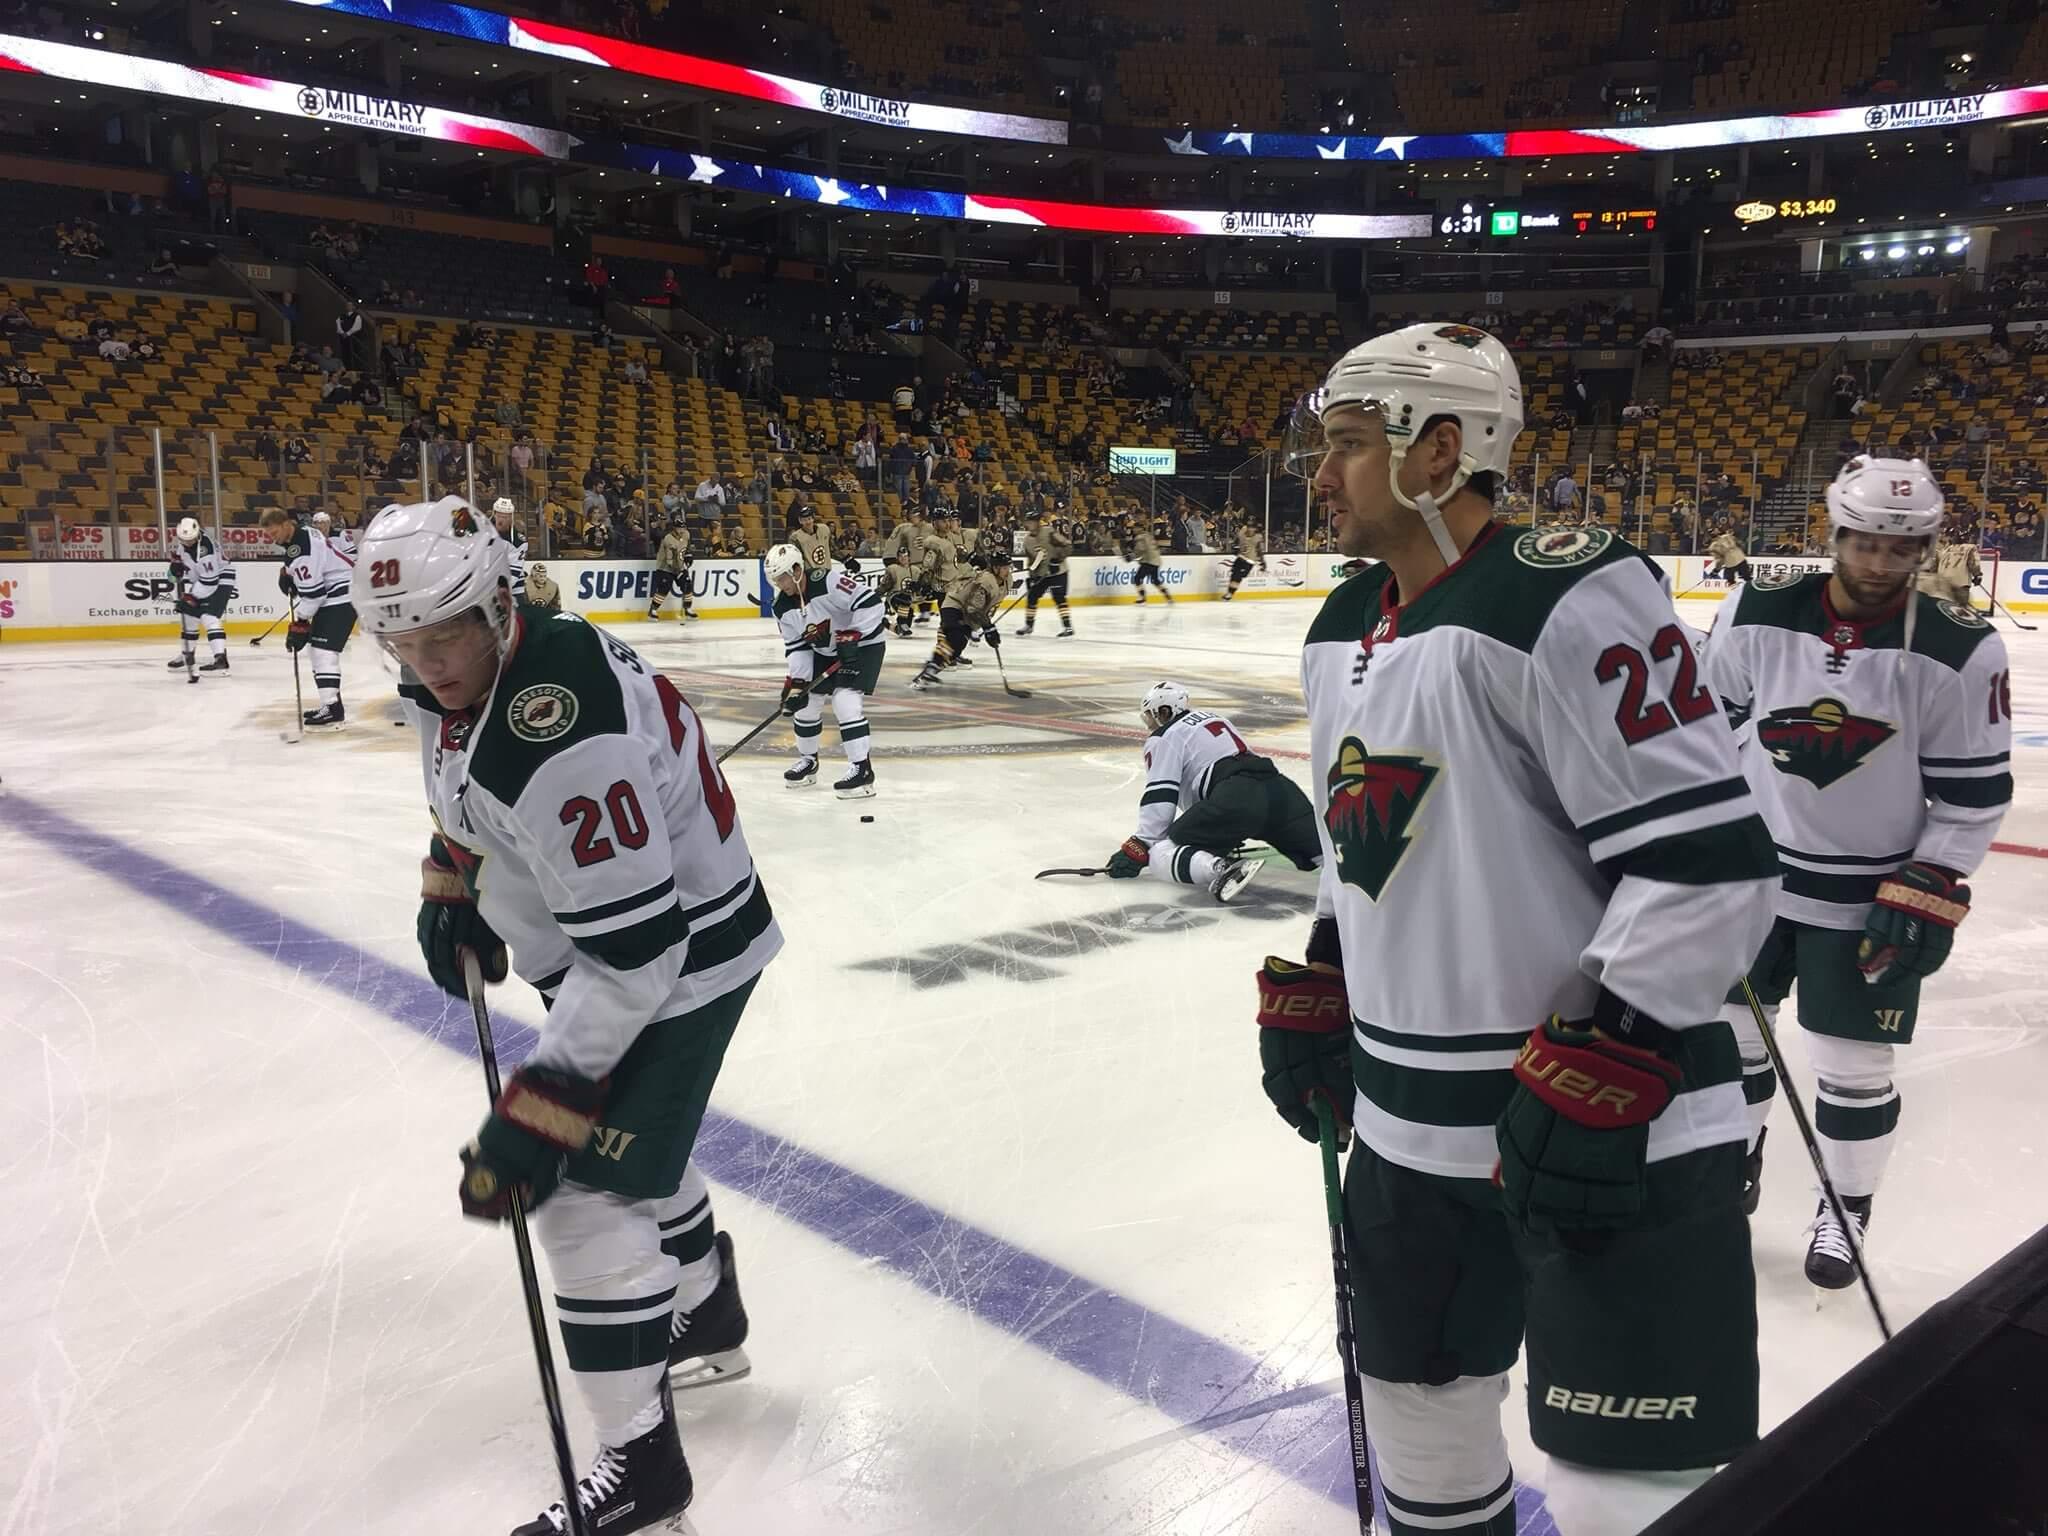 Чикаго – Финикс ставки, прогнозы на НХЛ, ставки на ПЛЭЙ Офф НХЛ